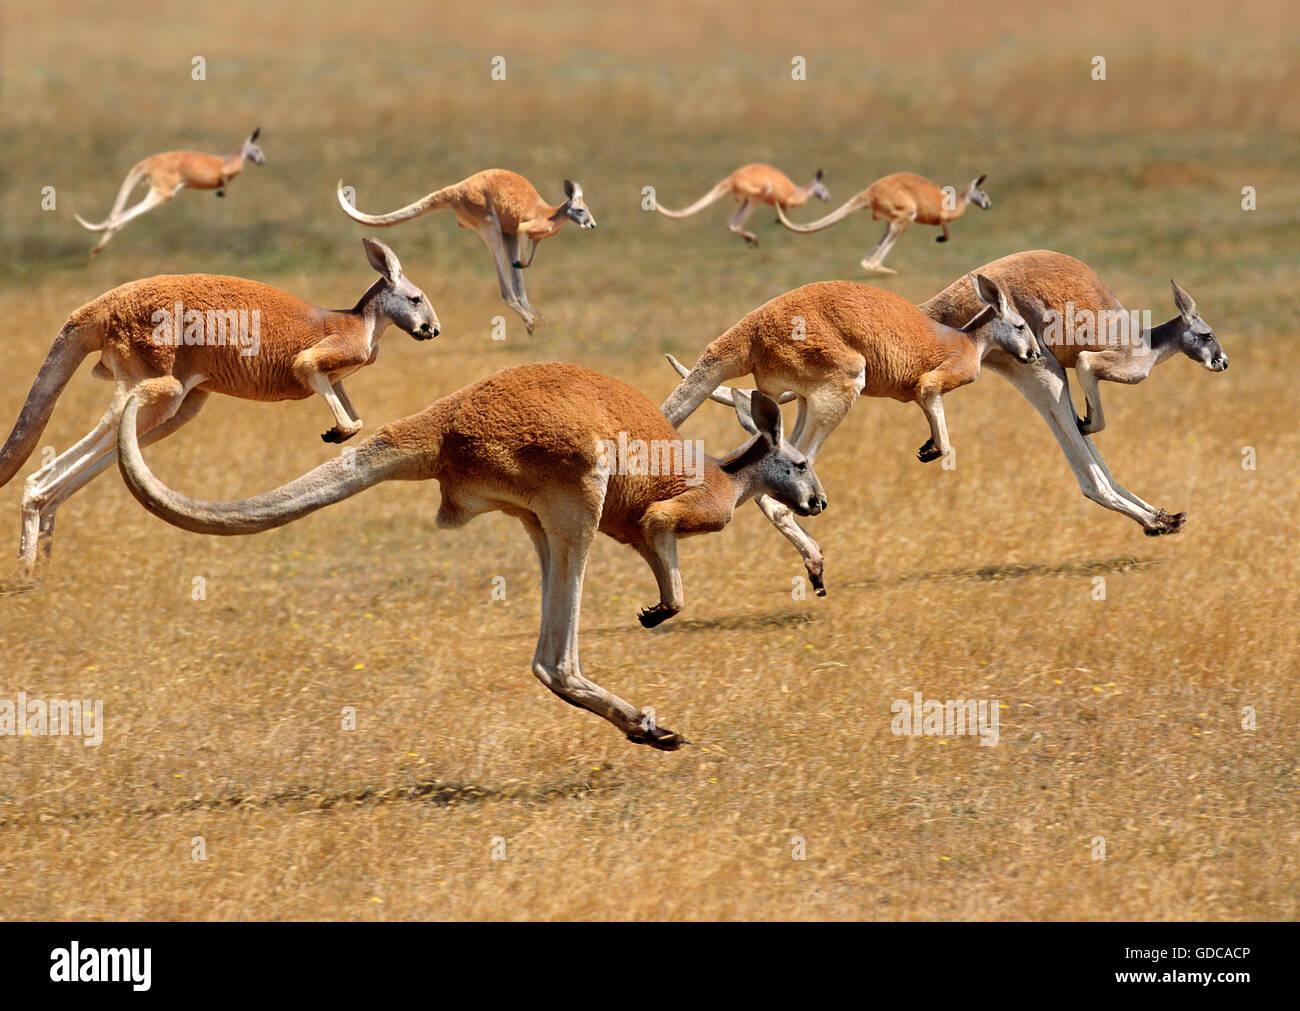 Free online group sex in Australia